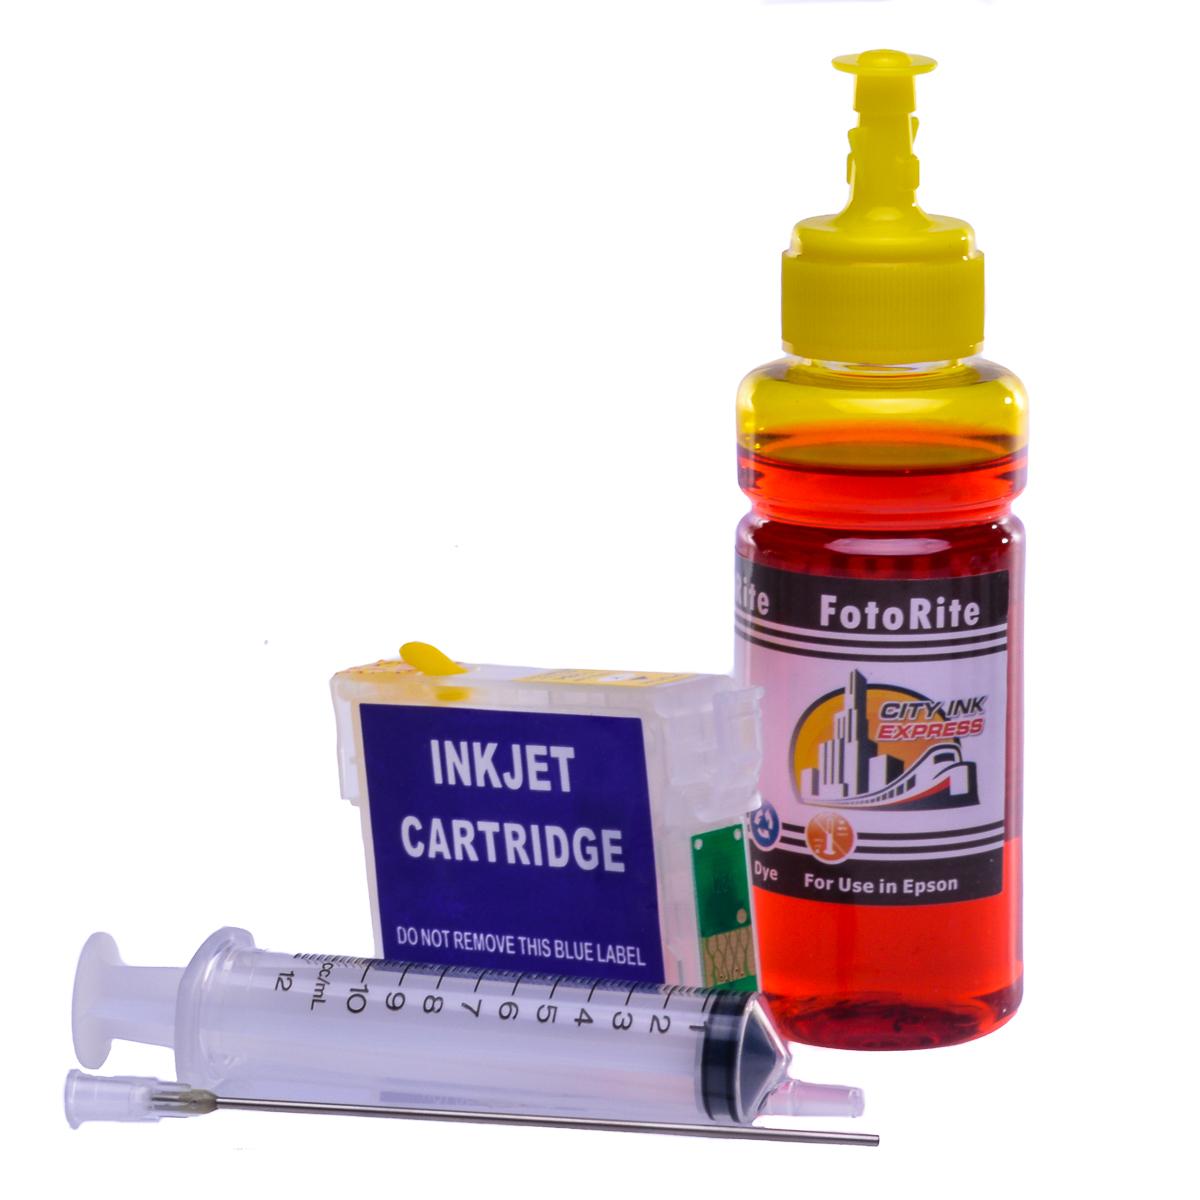 Refillable T0714 Yellow Cheap printer cartridges for Epson Stylus D120 C13T07144010 dye ink